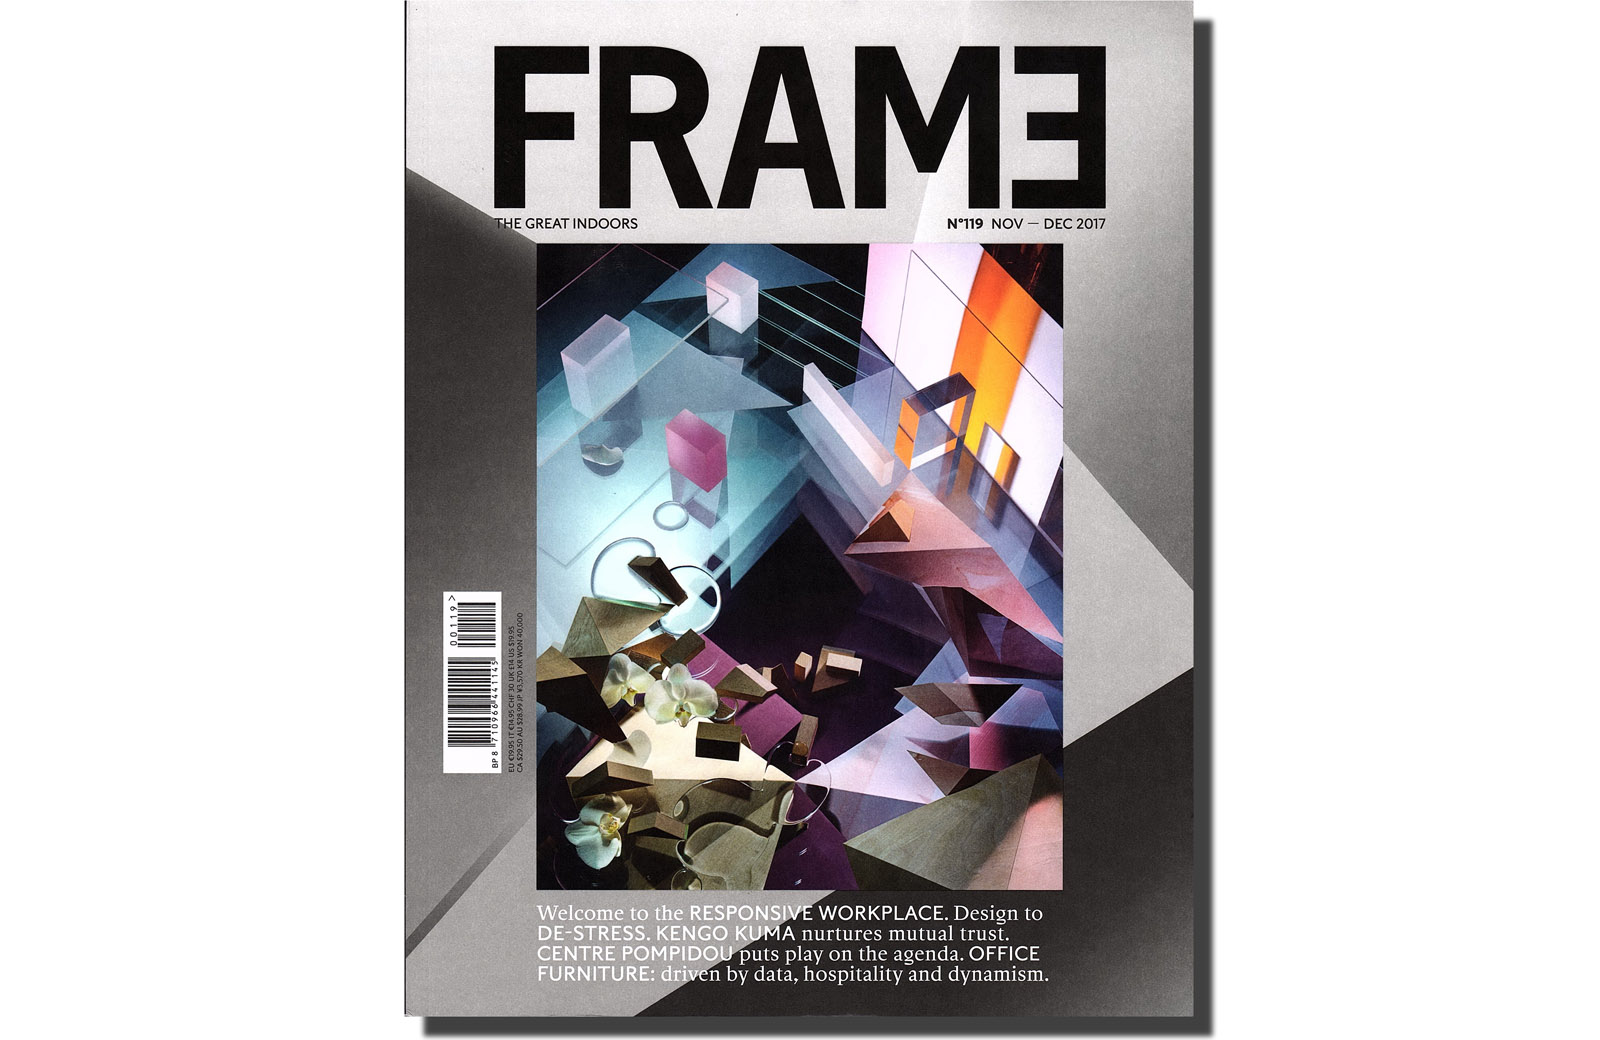 frame_miami-concept-store_portada